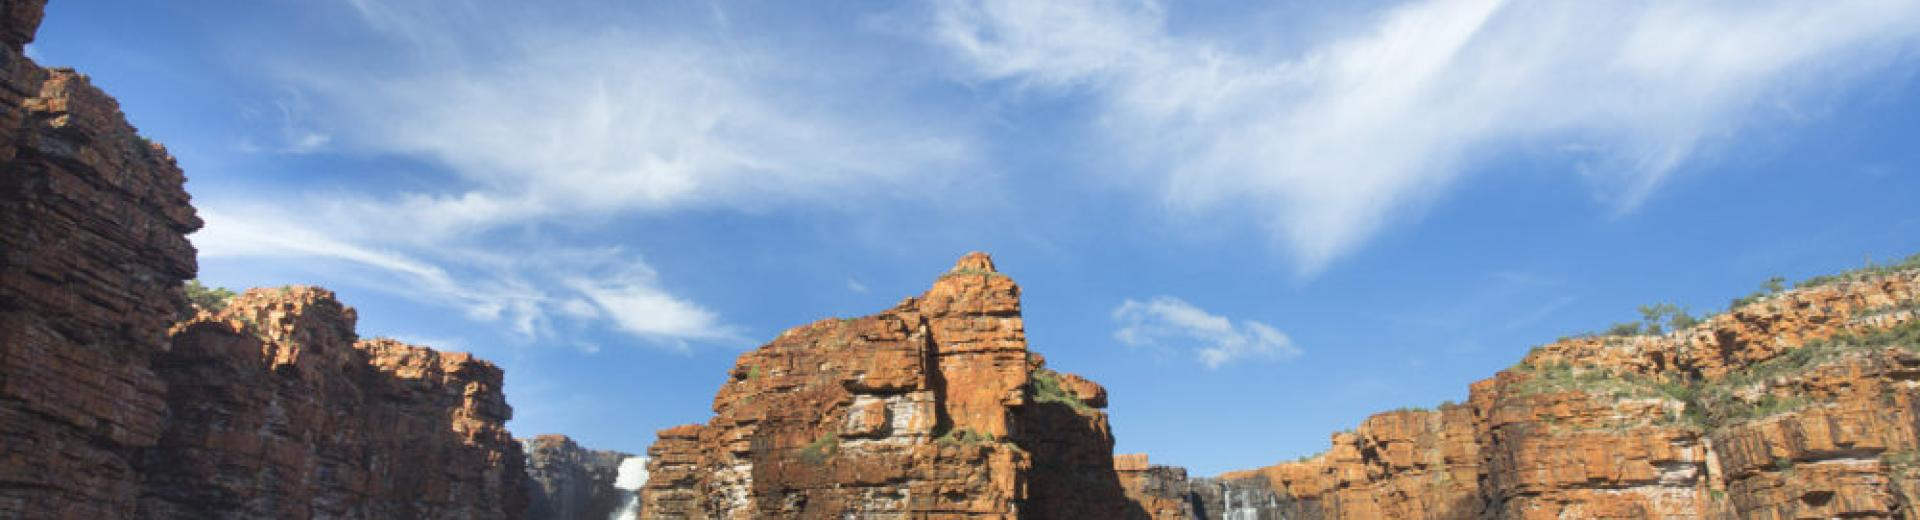 kimberley kinggeorge